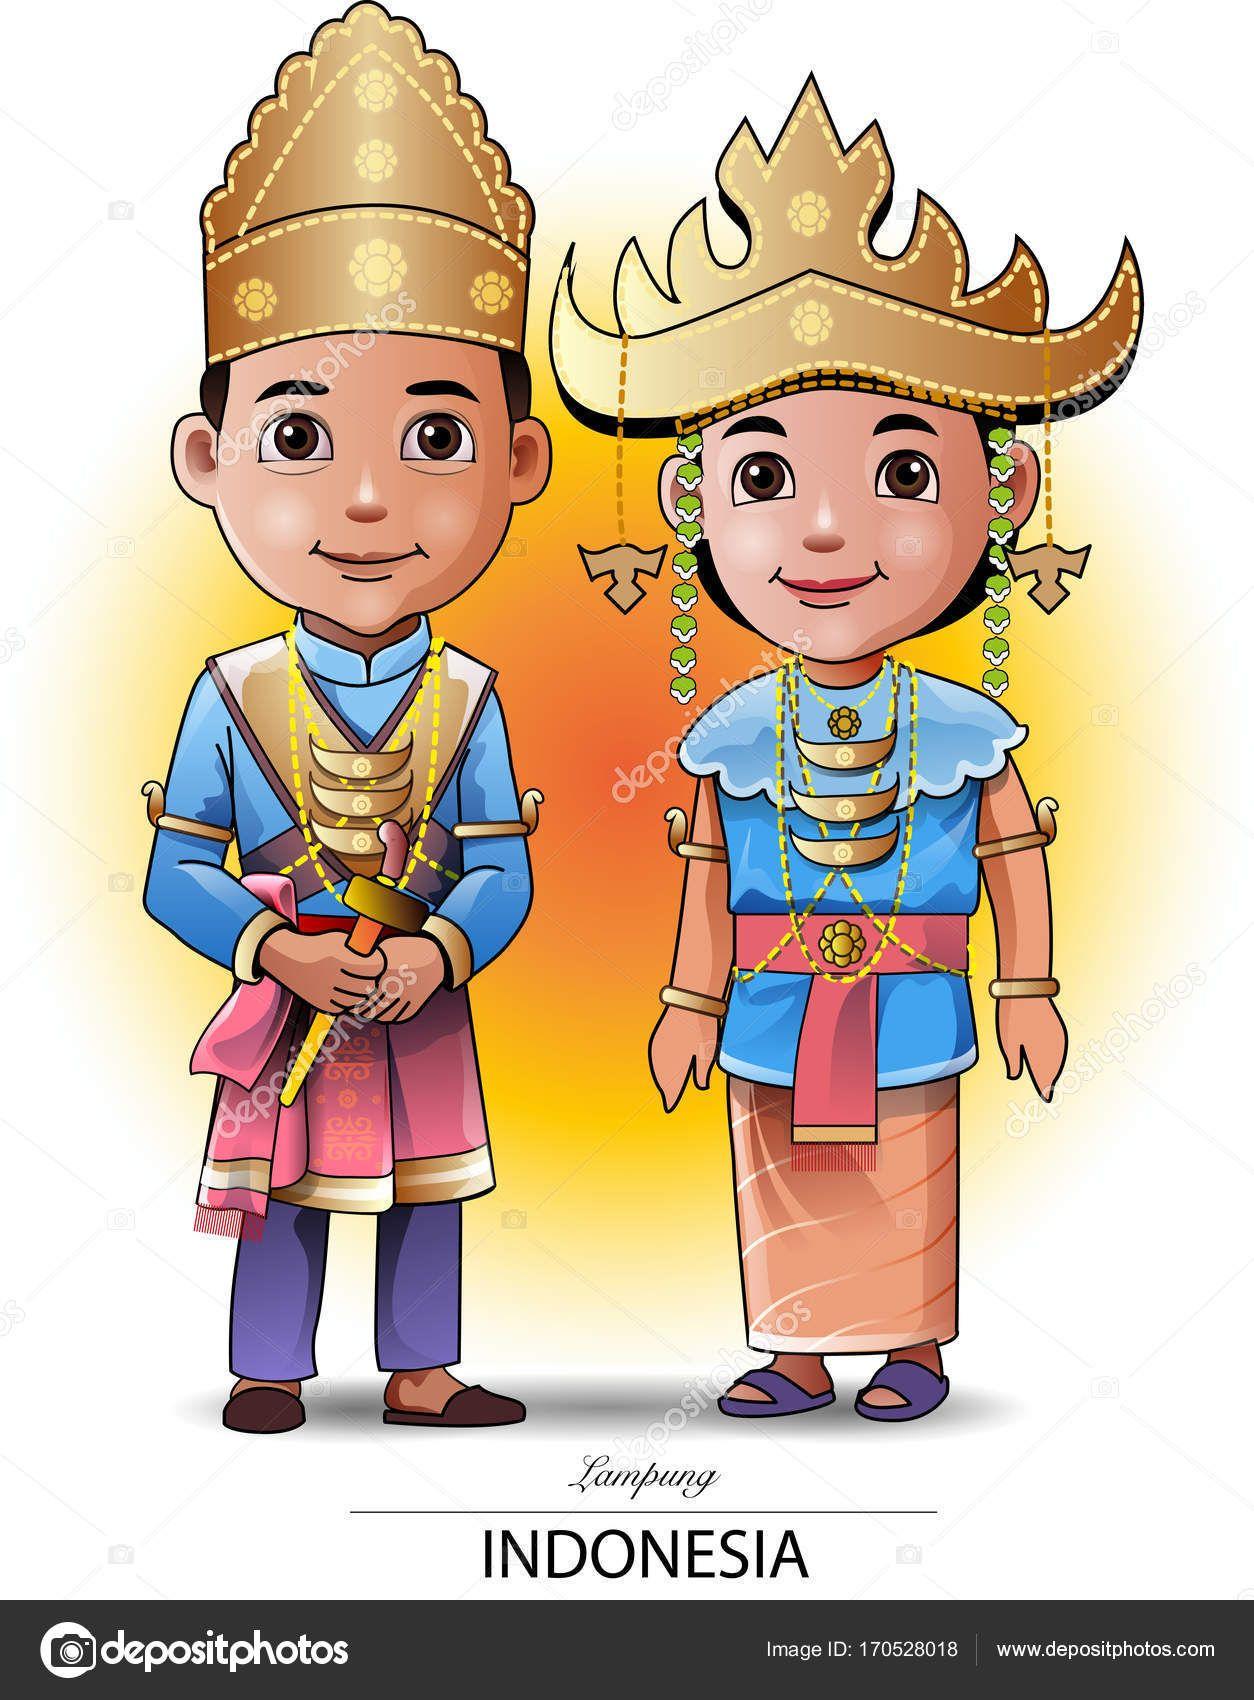 Gambar Kartun Pakaian Adat Lampung